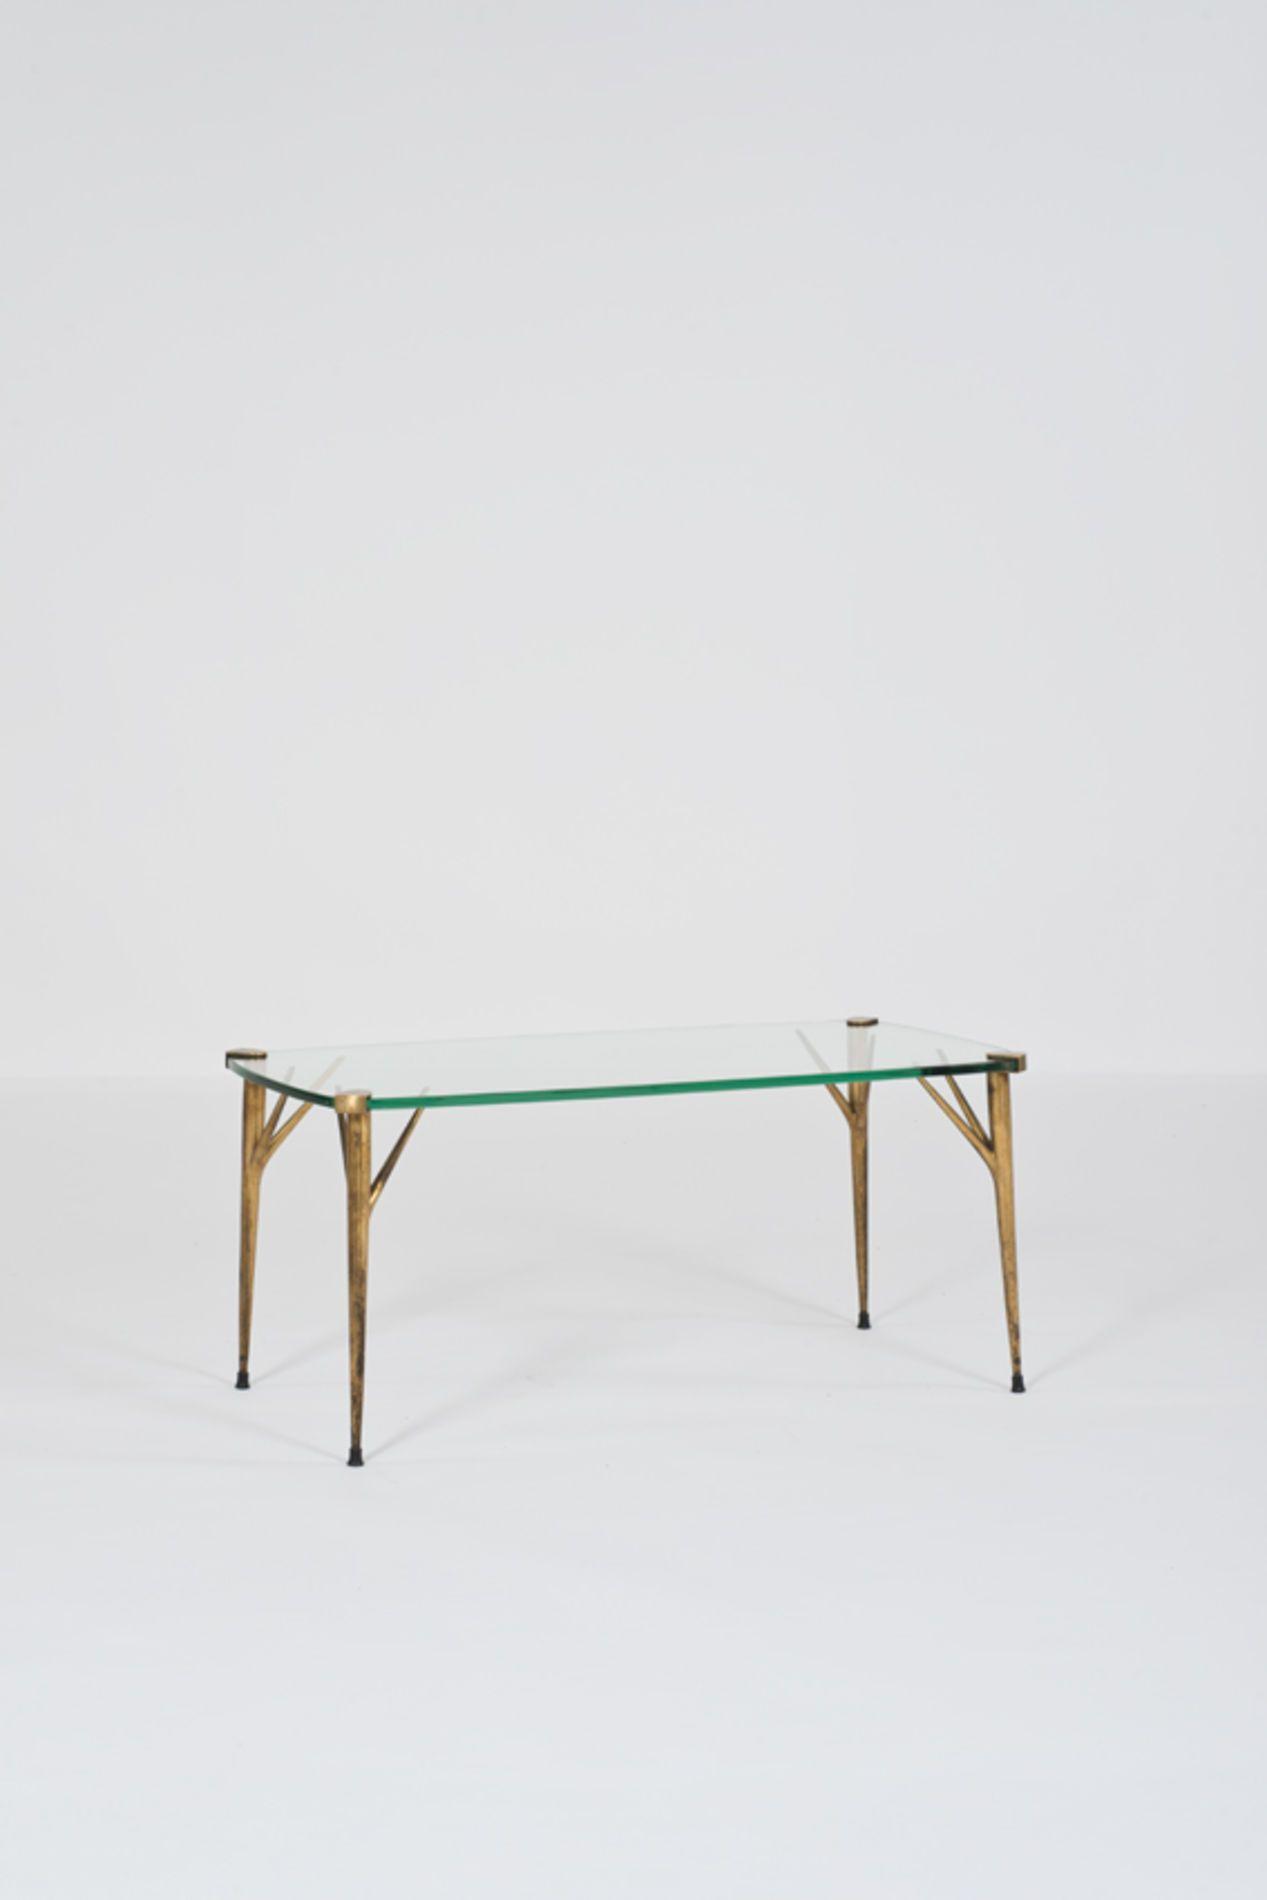 max ingrand edition fontana arte 1956 furniture pinterest